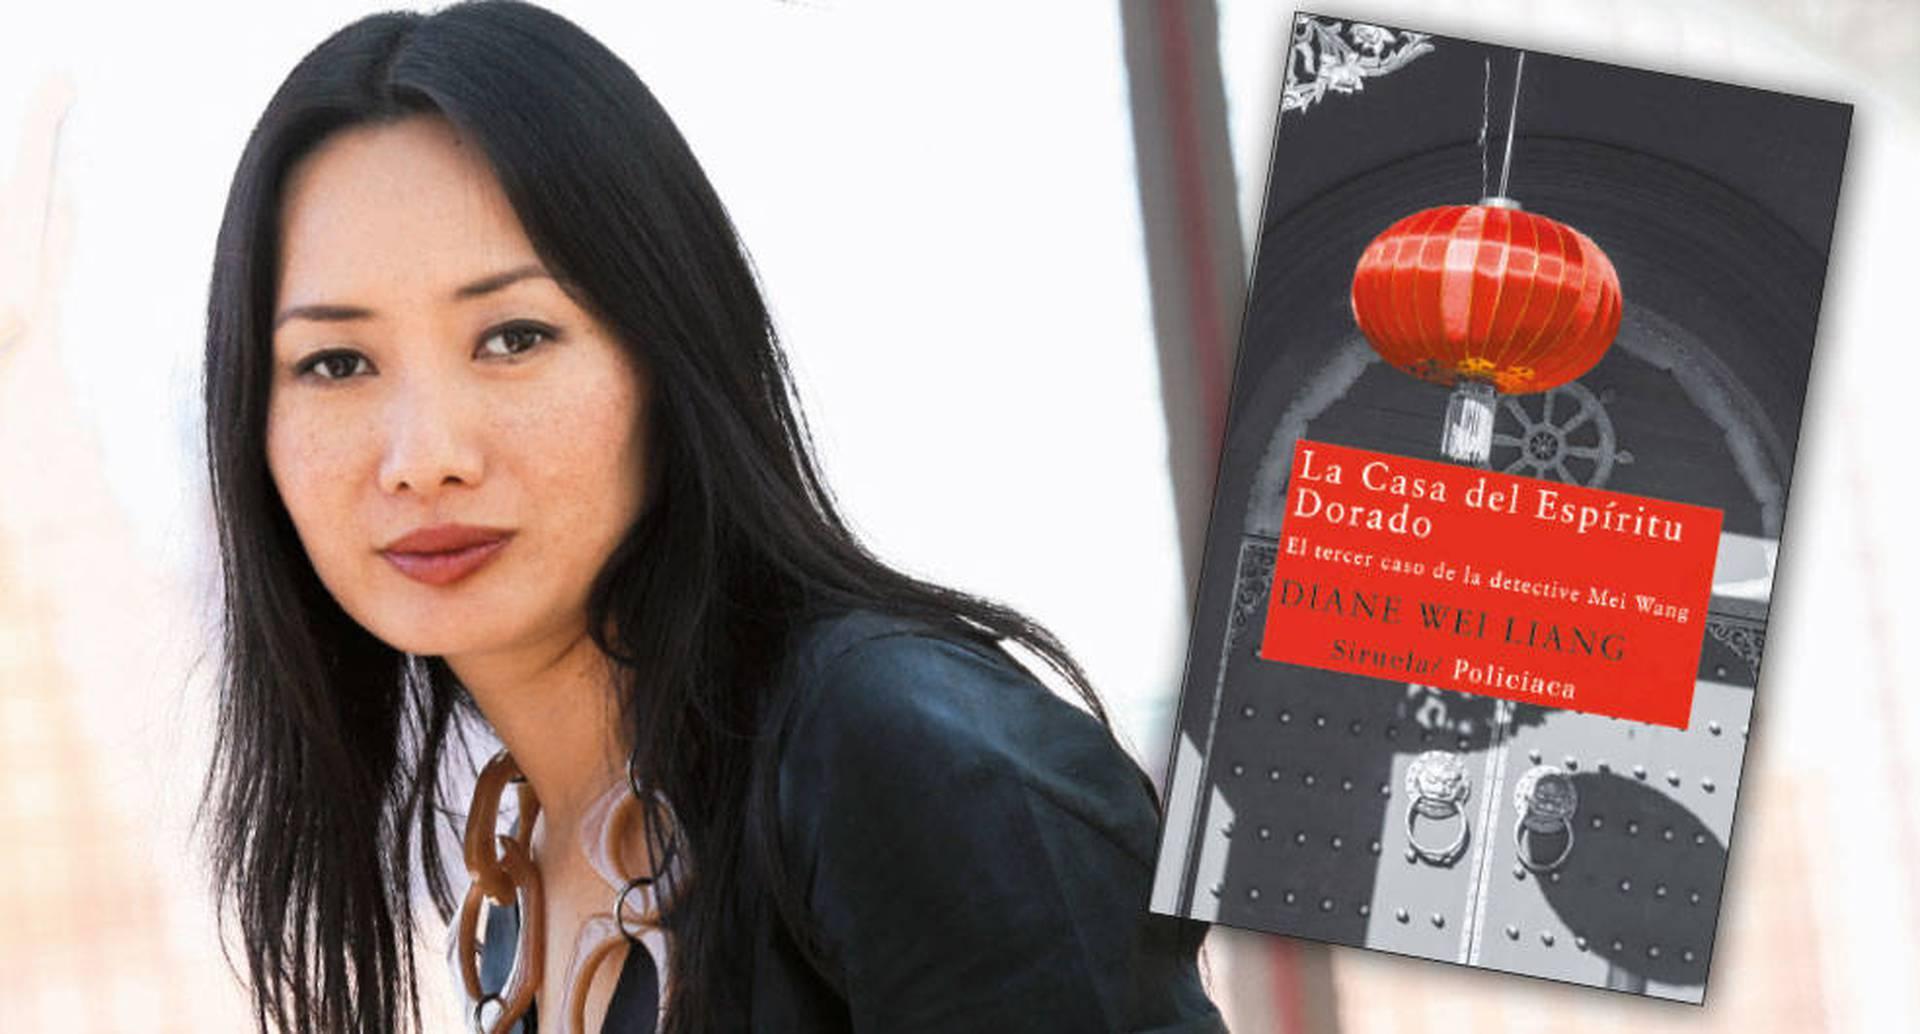 Diane Wei Liang nació en Pekín y vive en Reino Unido.